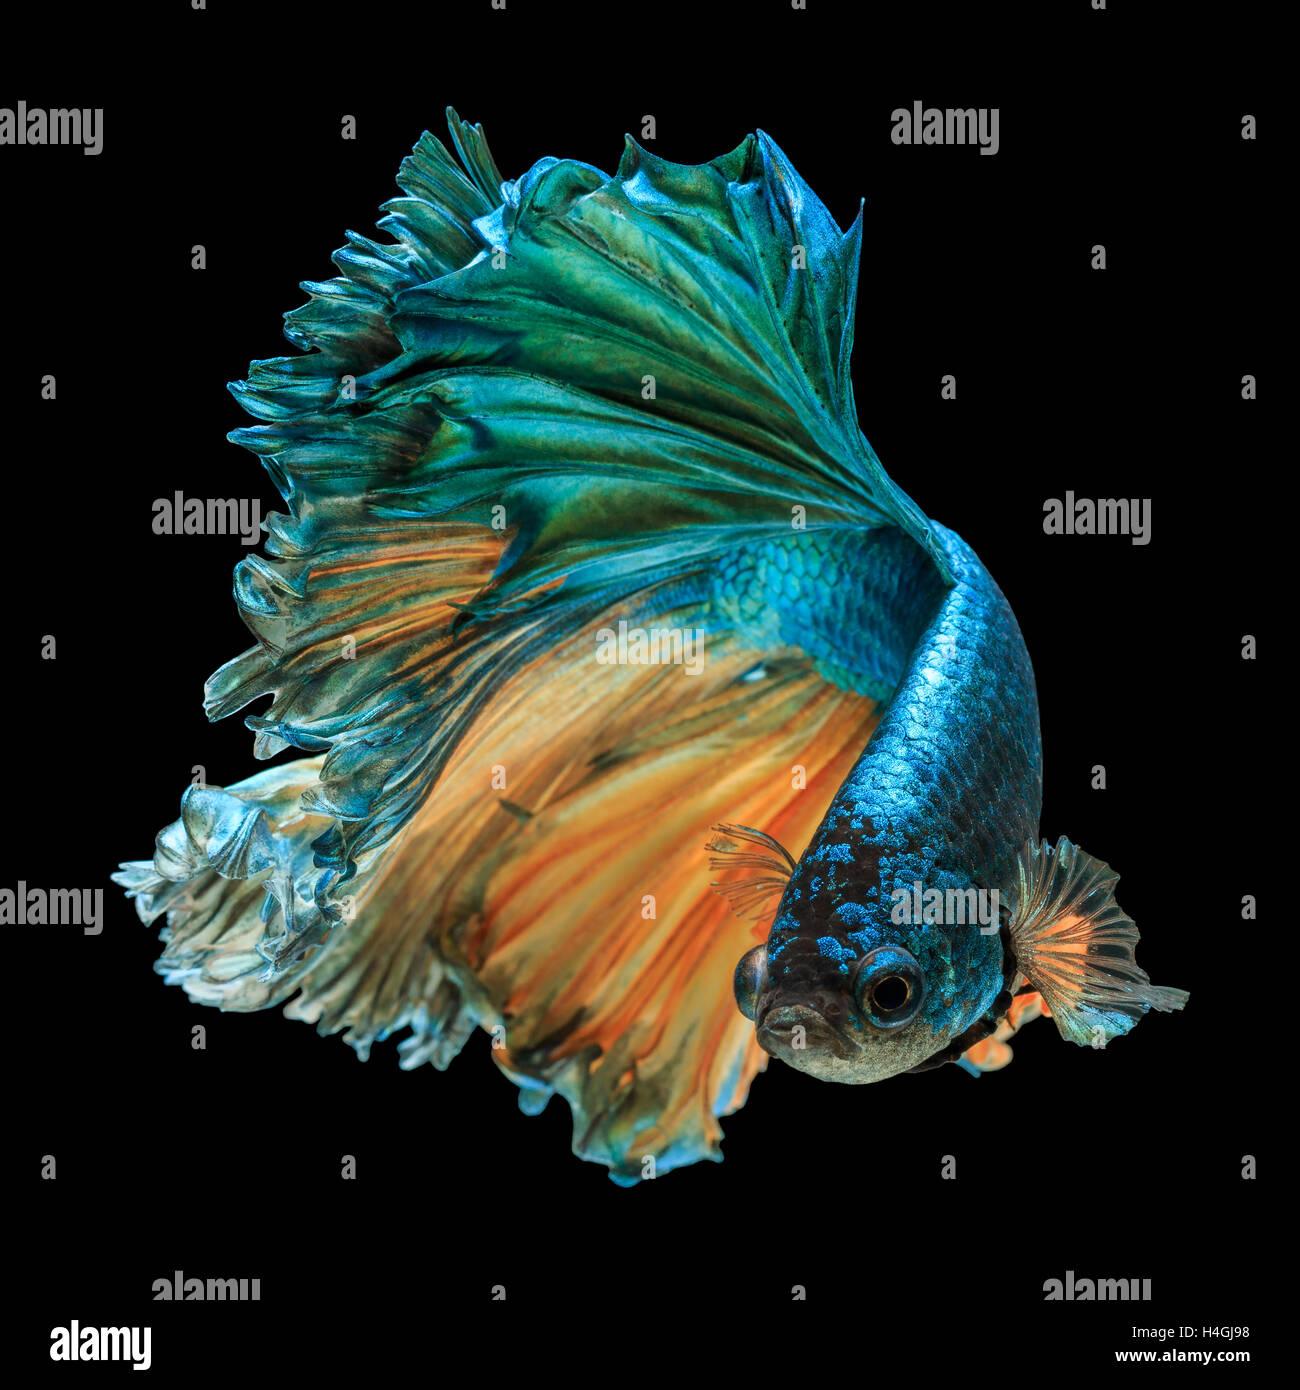 betta fish, siamese fighting fish 'Half moon' isolated on black background - Stock Image